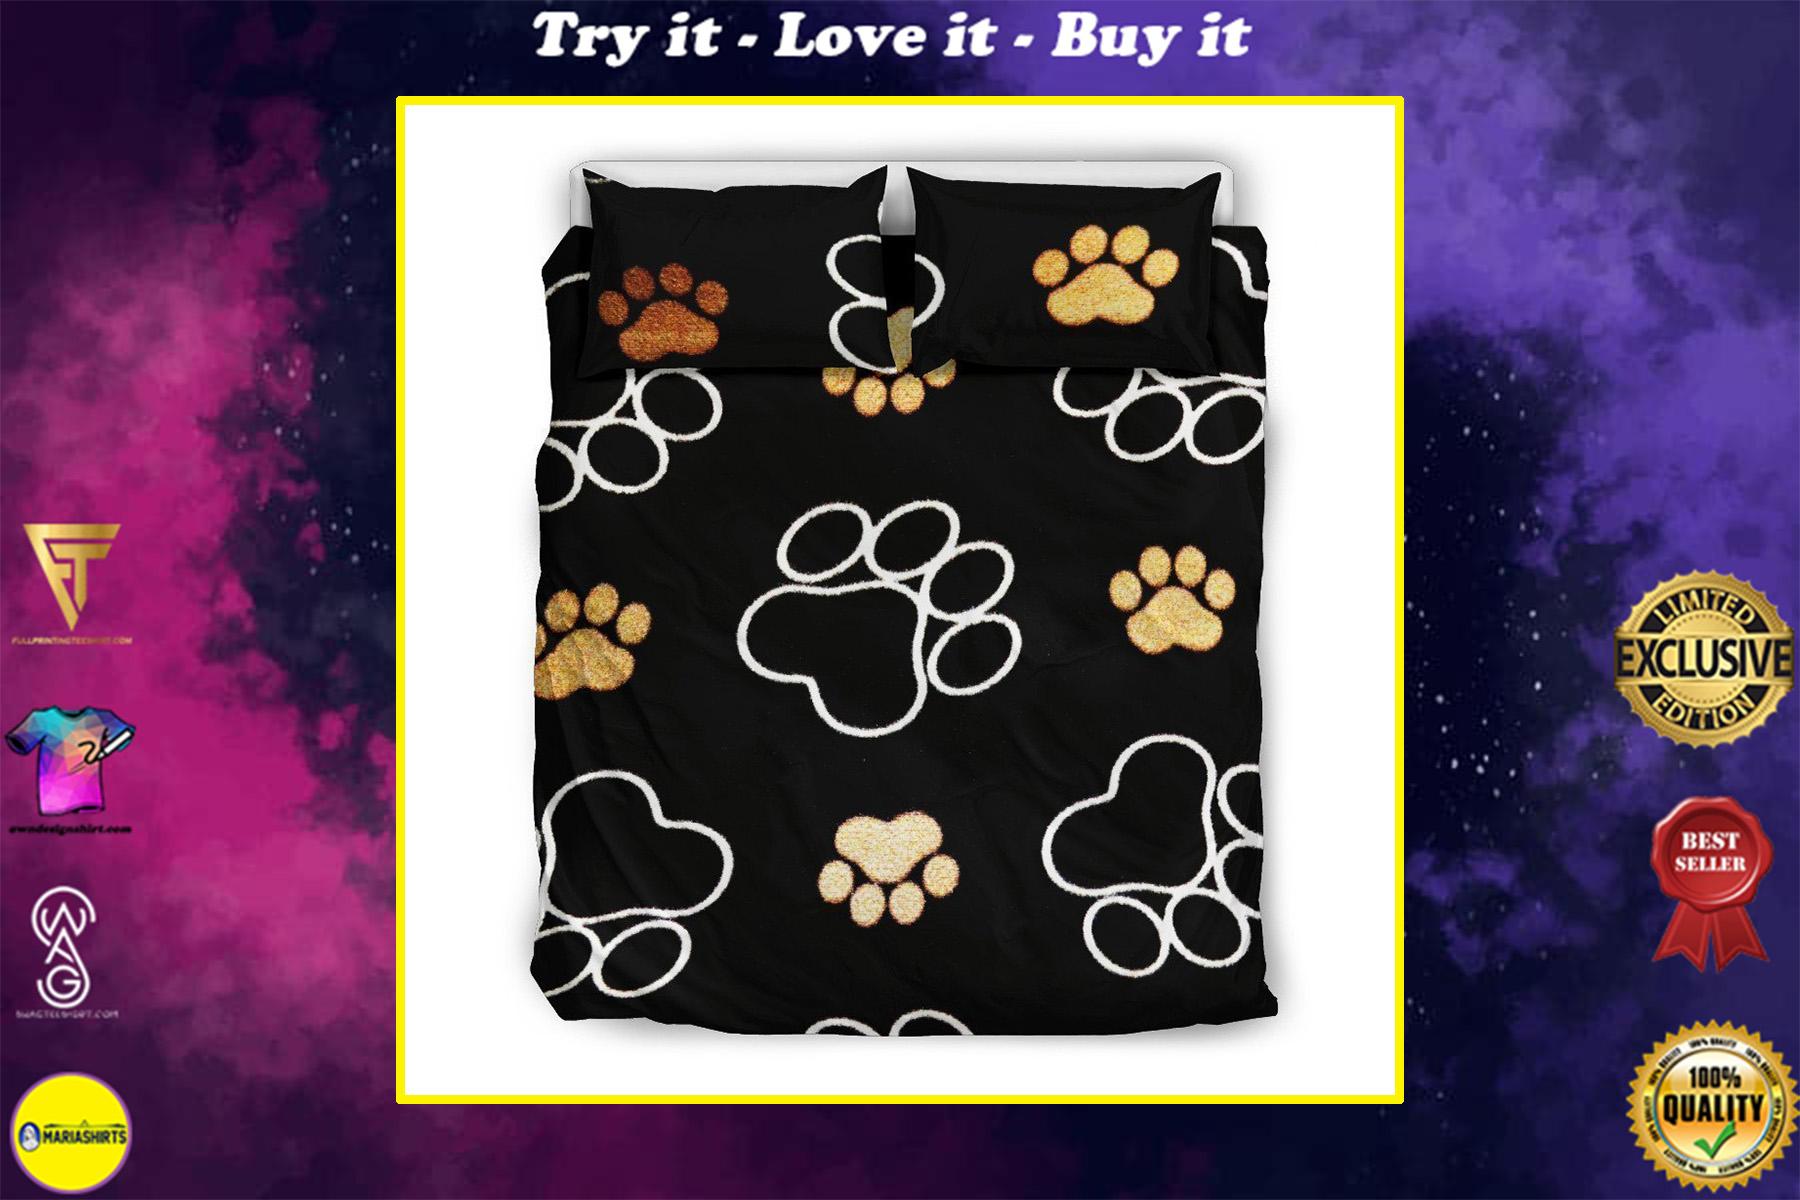 black dog paw all over printed bedding set